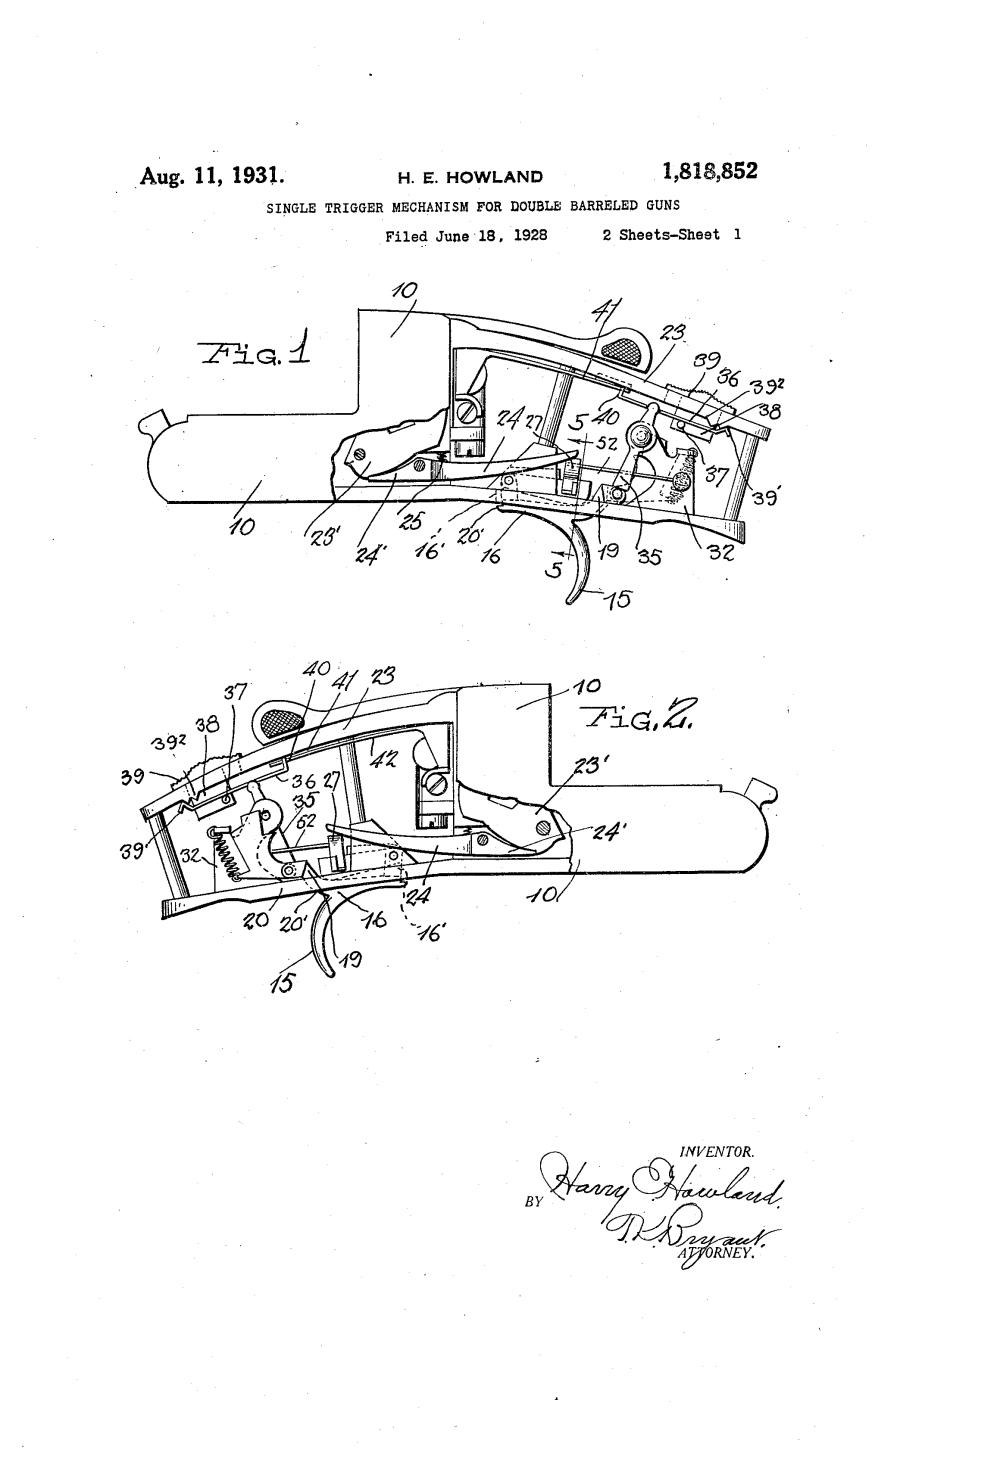 medium resolution of us1818852a single trigger mechanism for double barreled guns google patents